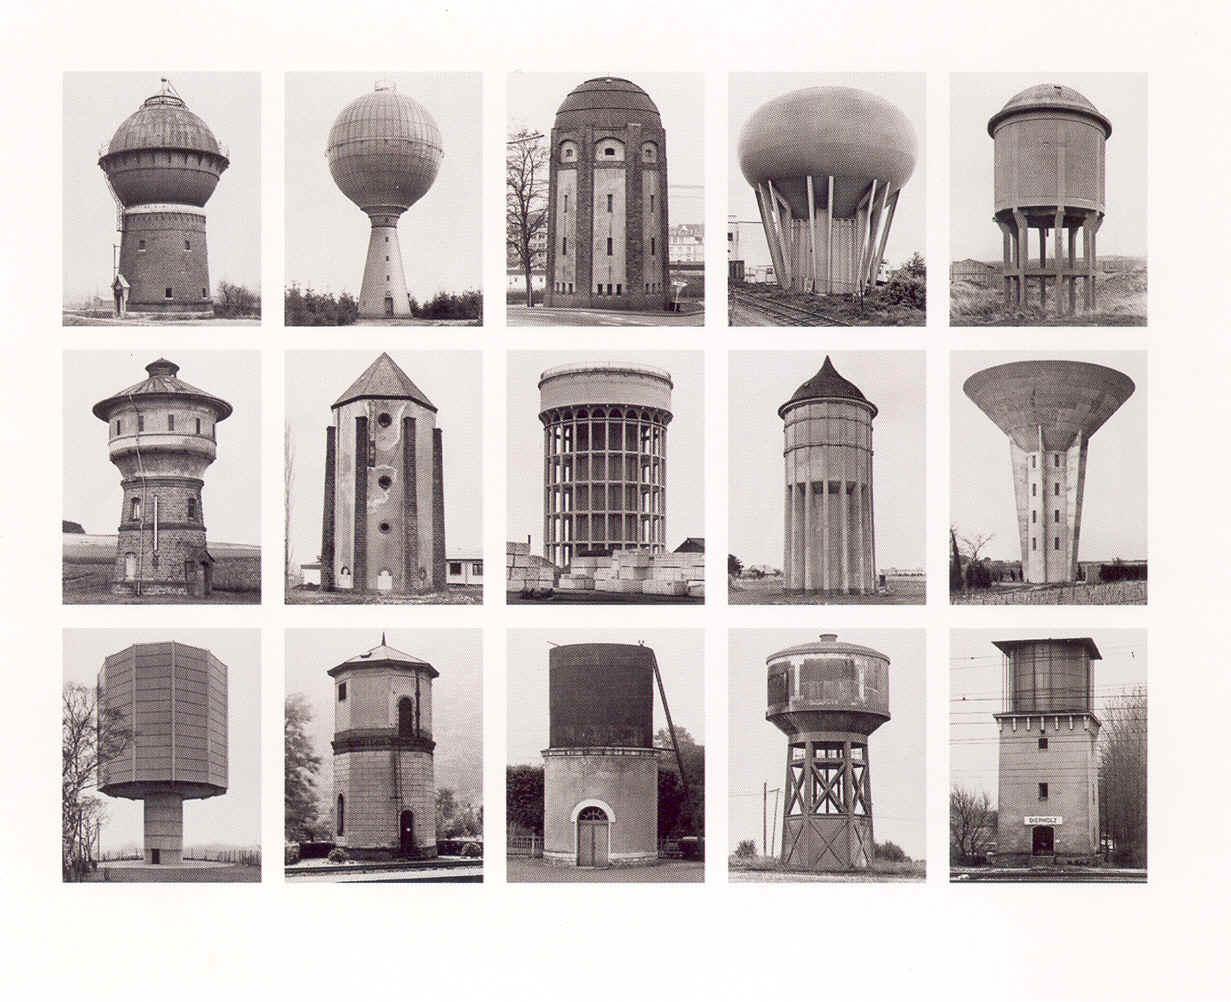 bernd-et-hilla-becher-typologie-photo-02